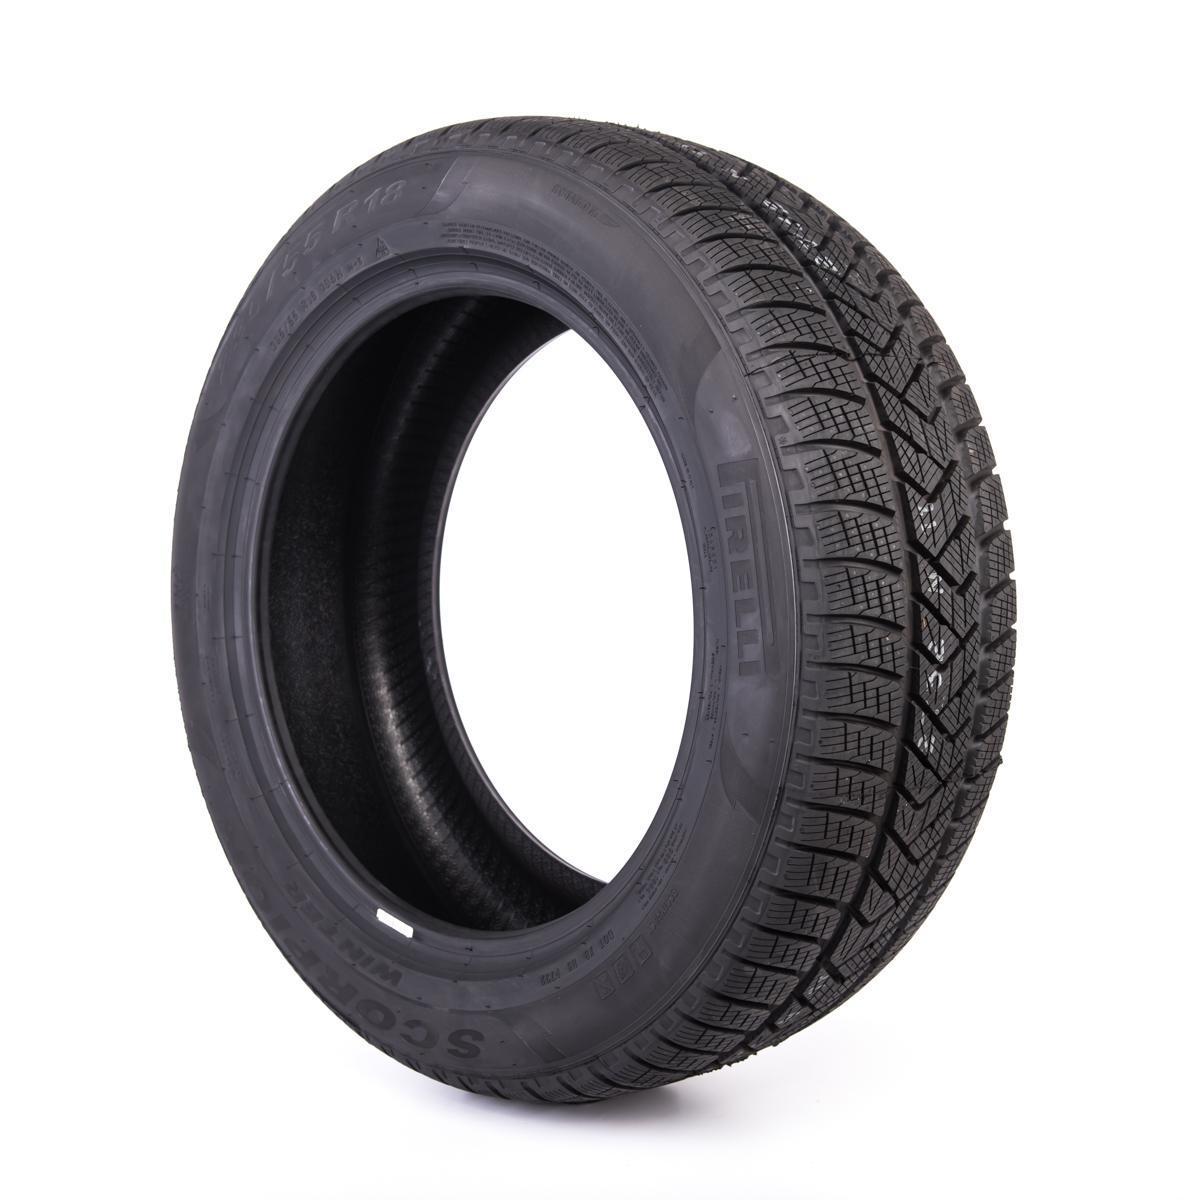 Pirelli, SCORPION WINTER Vinter 96184